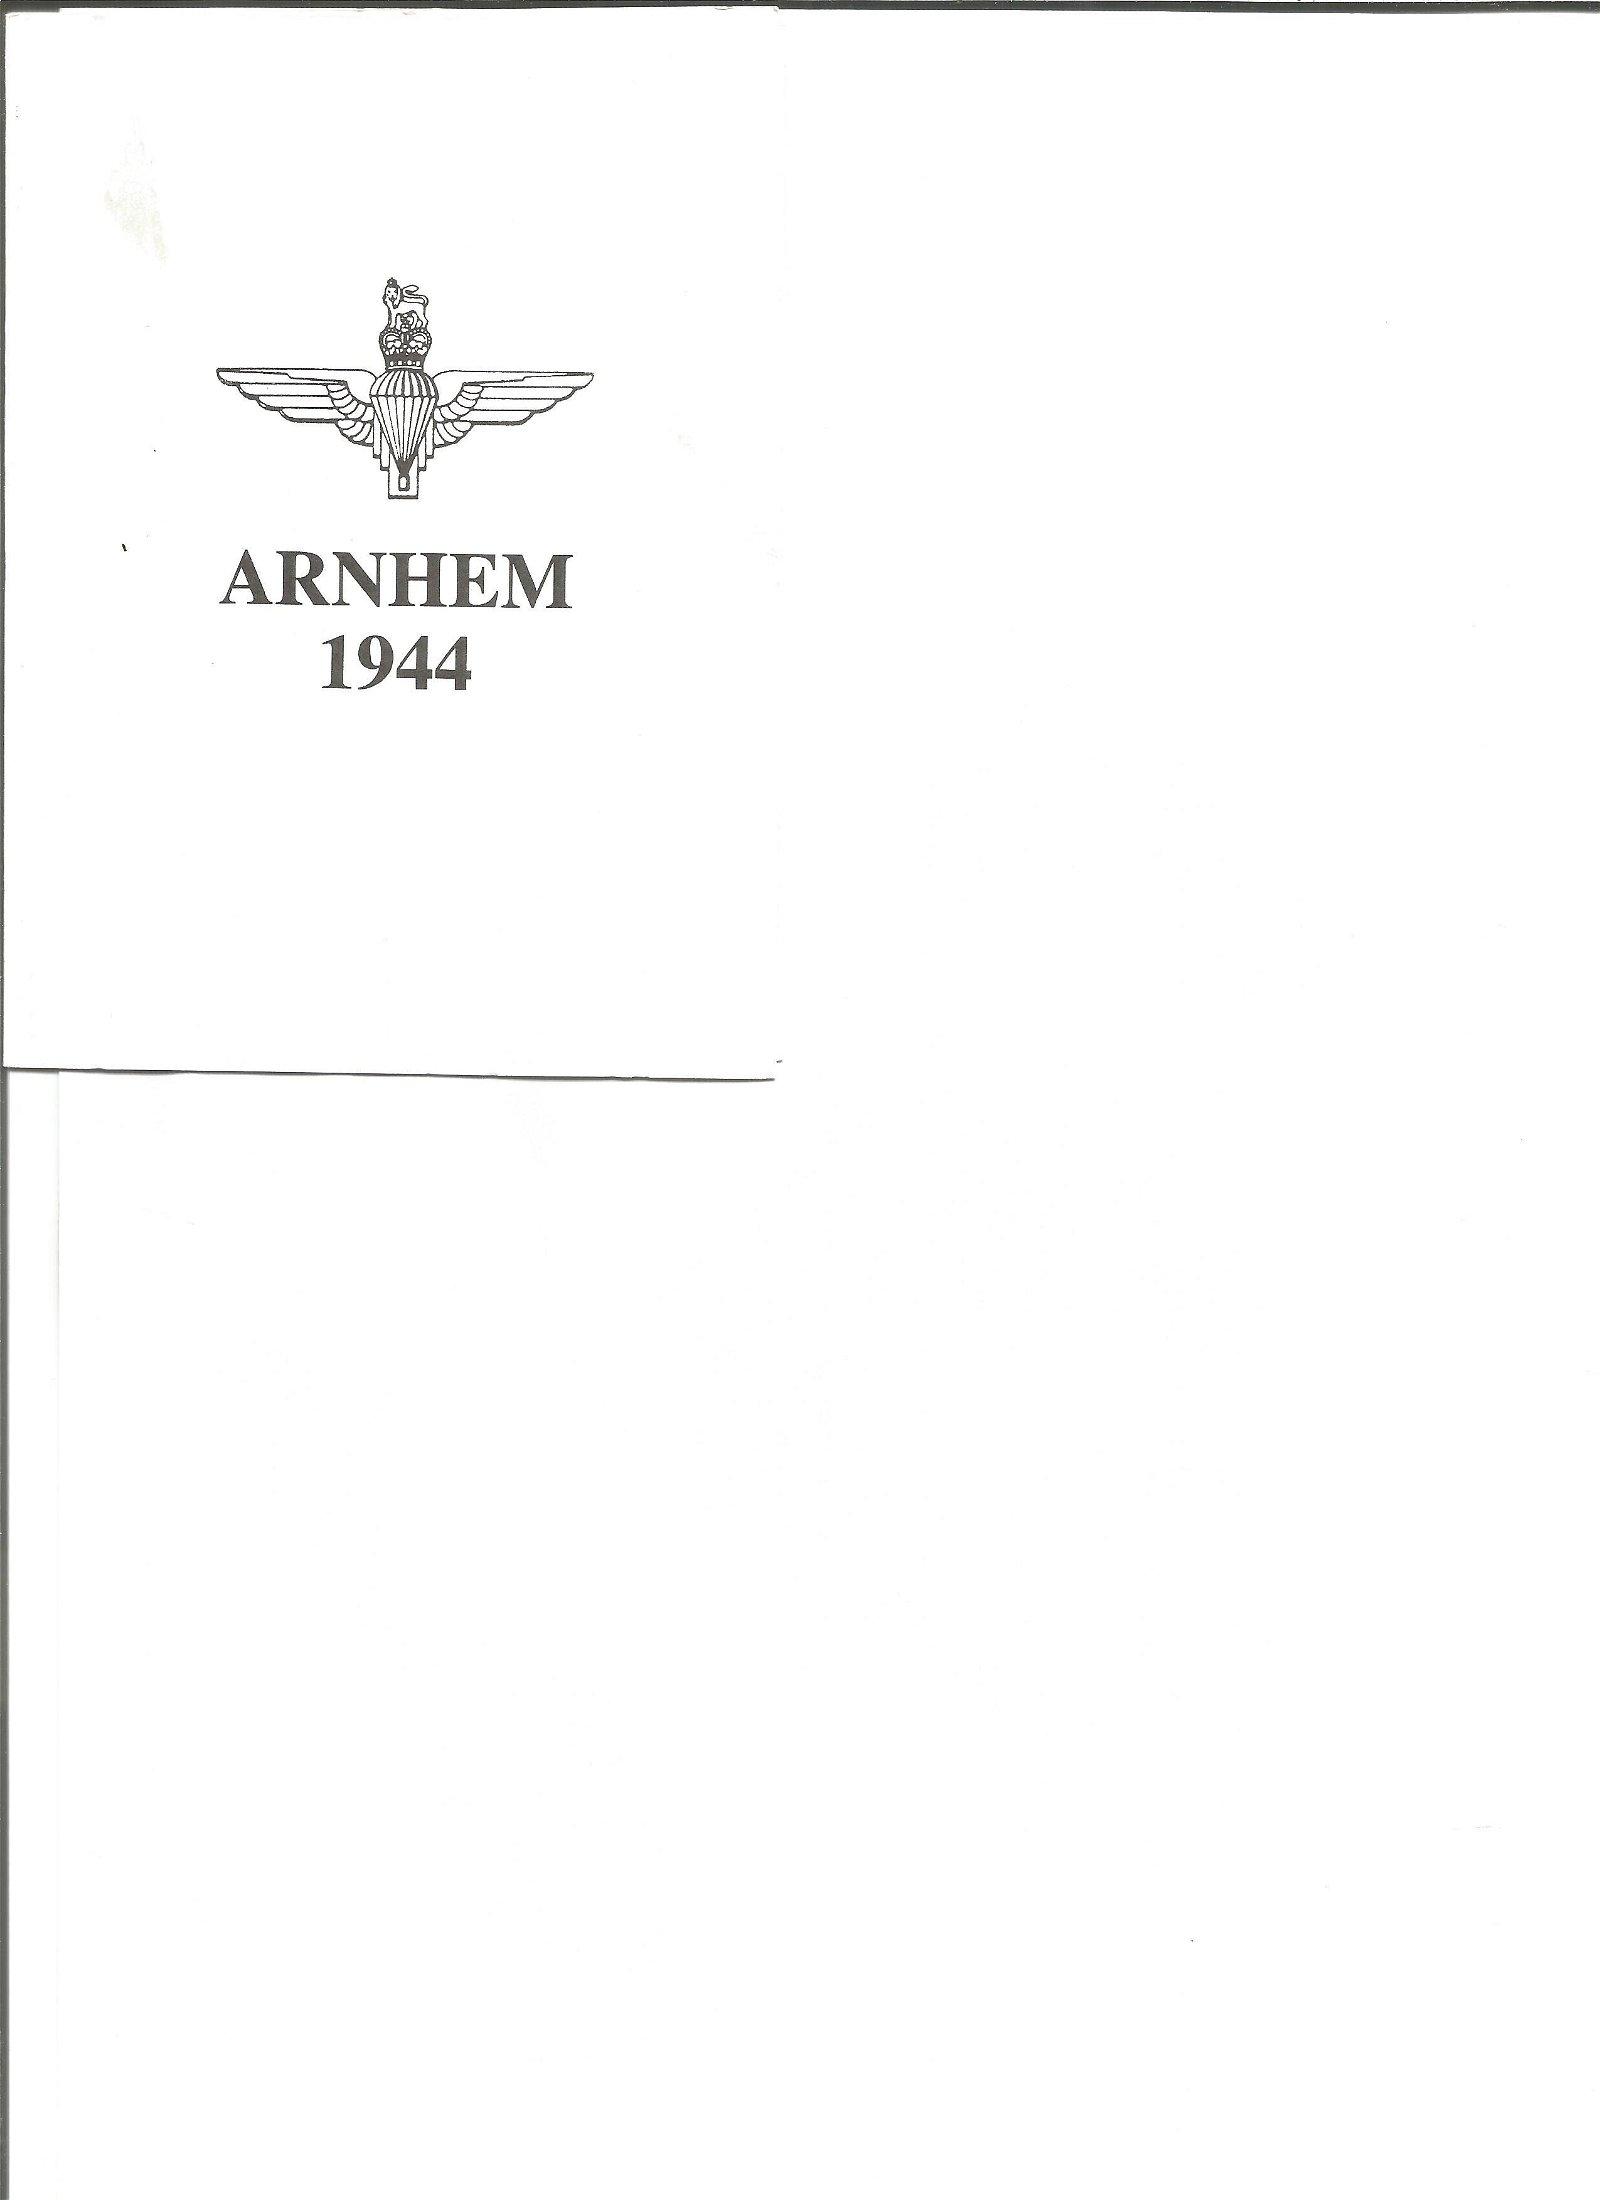 Arnhem 1944 phonecard in presentation wallet. No 13 of